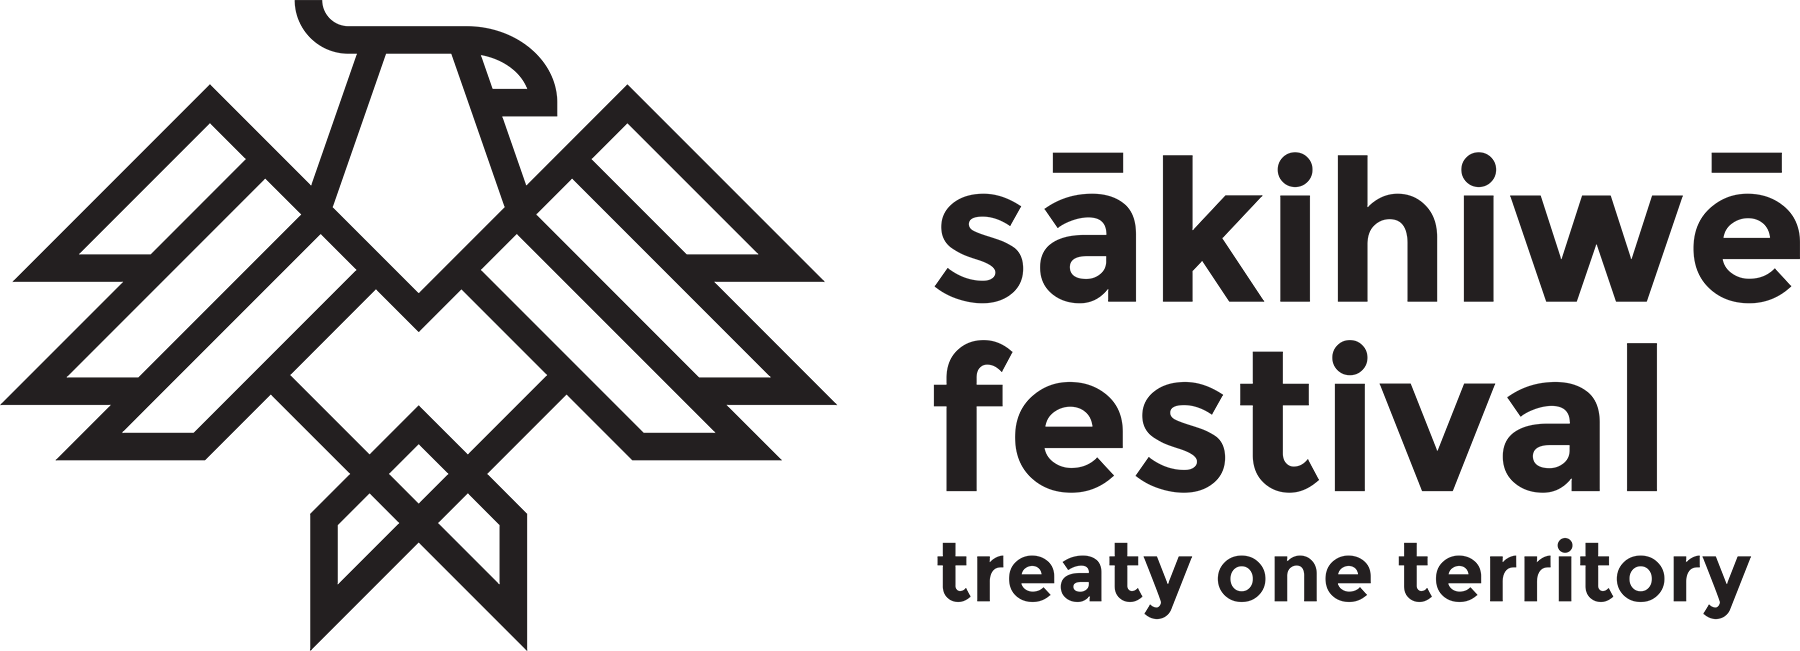 Sakihiwe logo - one colour